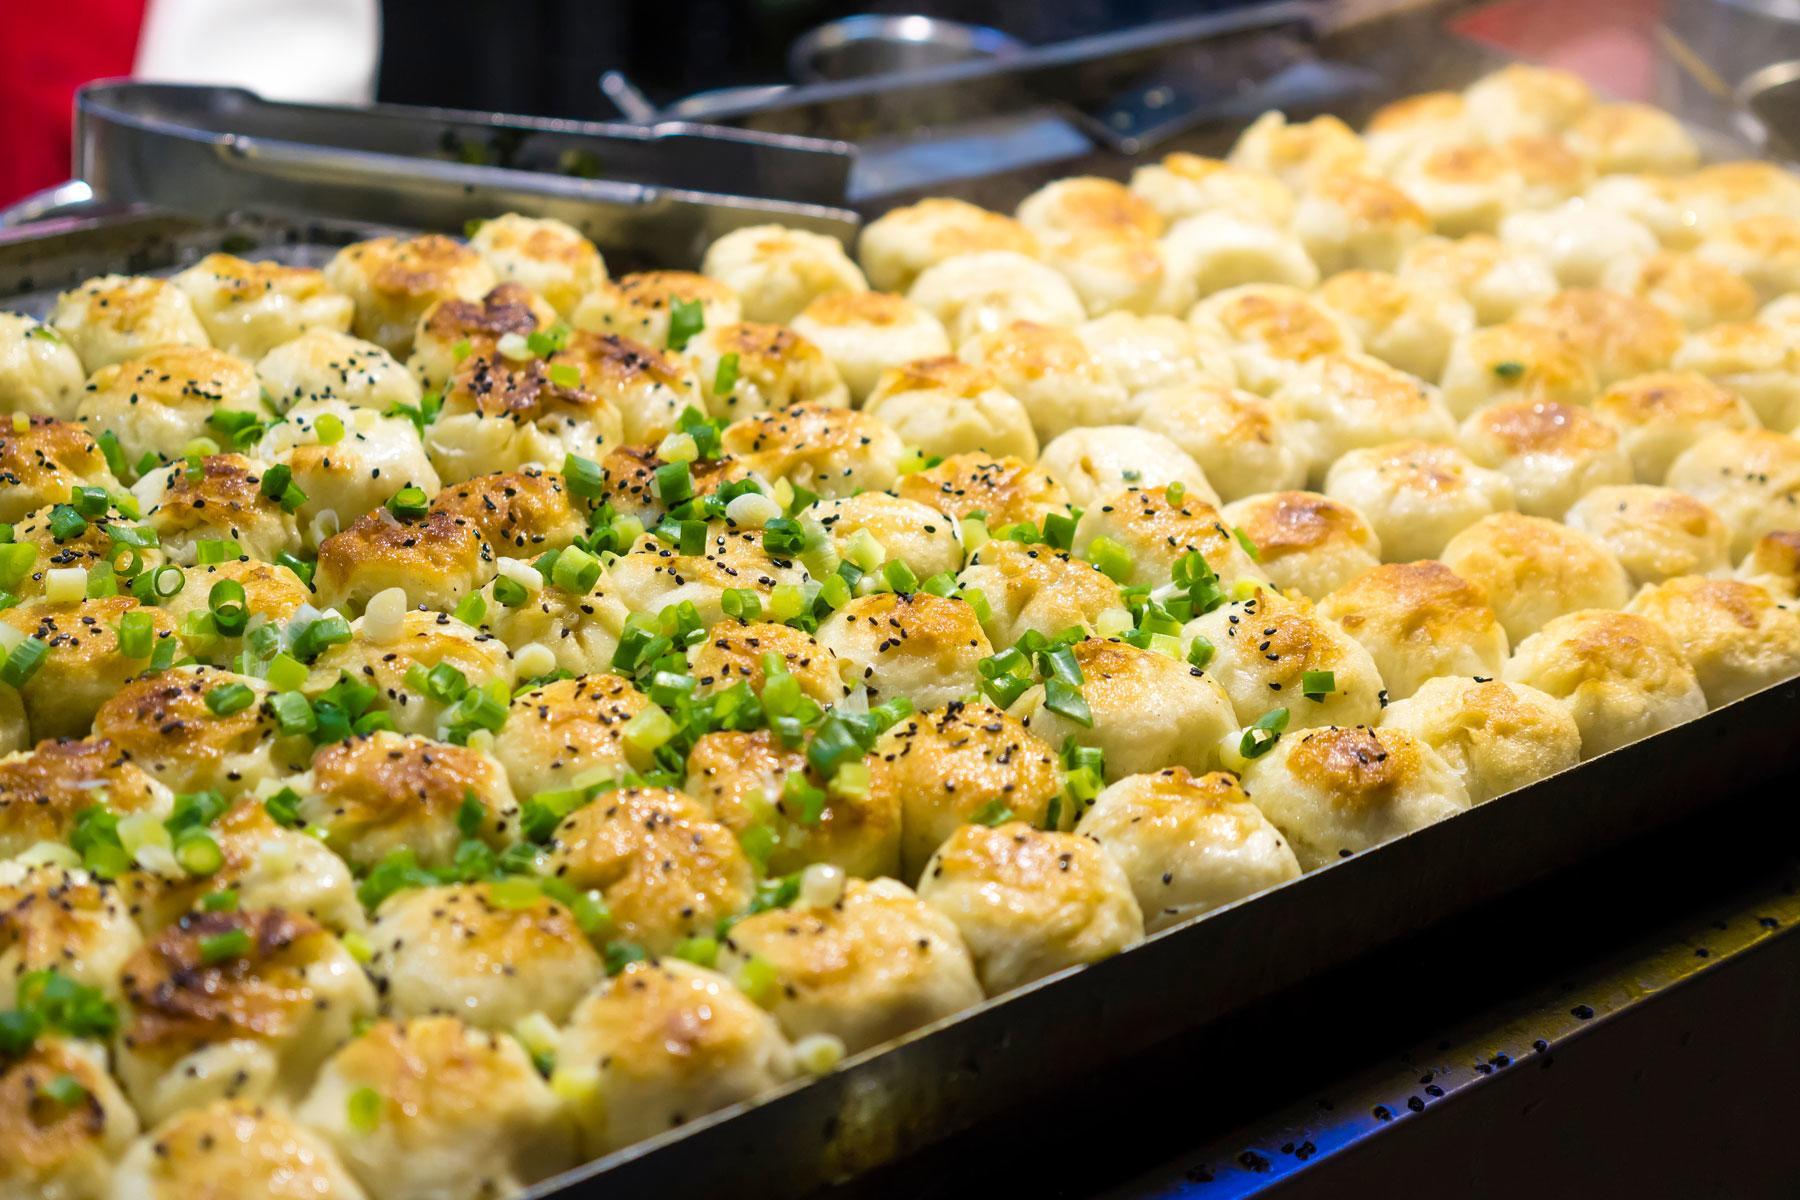 Pan fried pork dumplings.